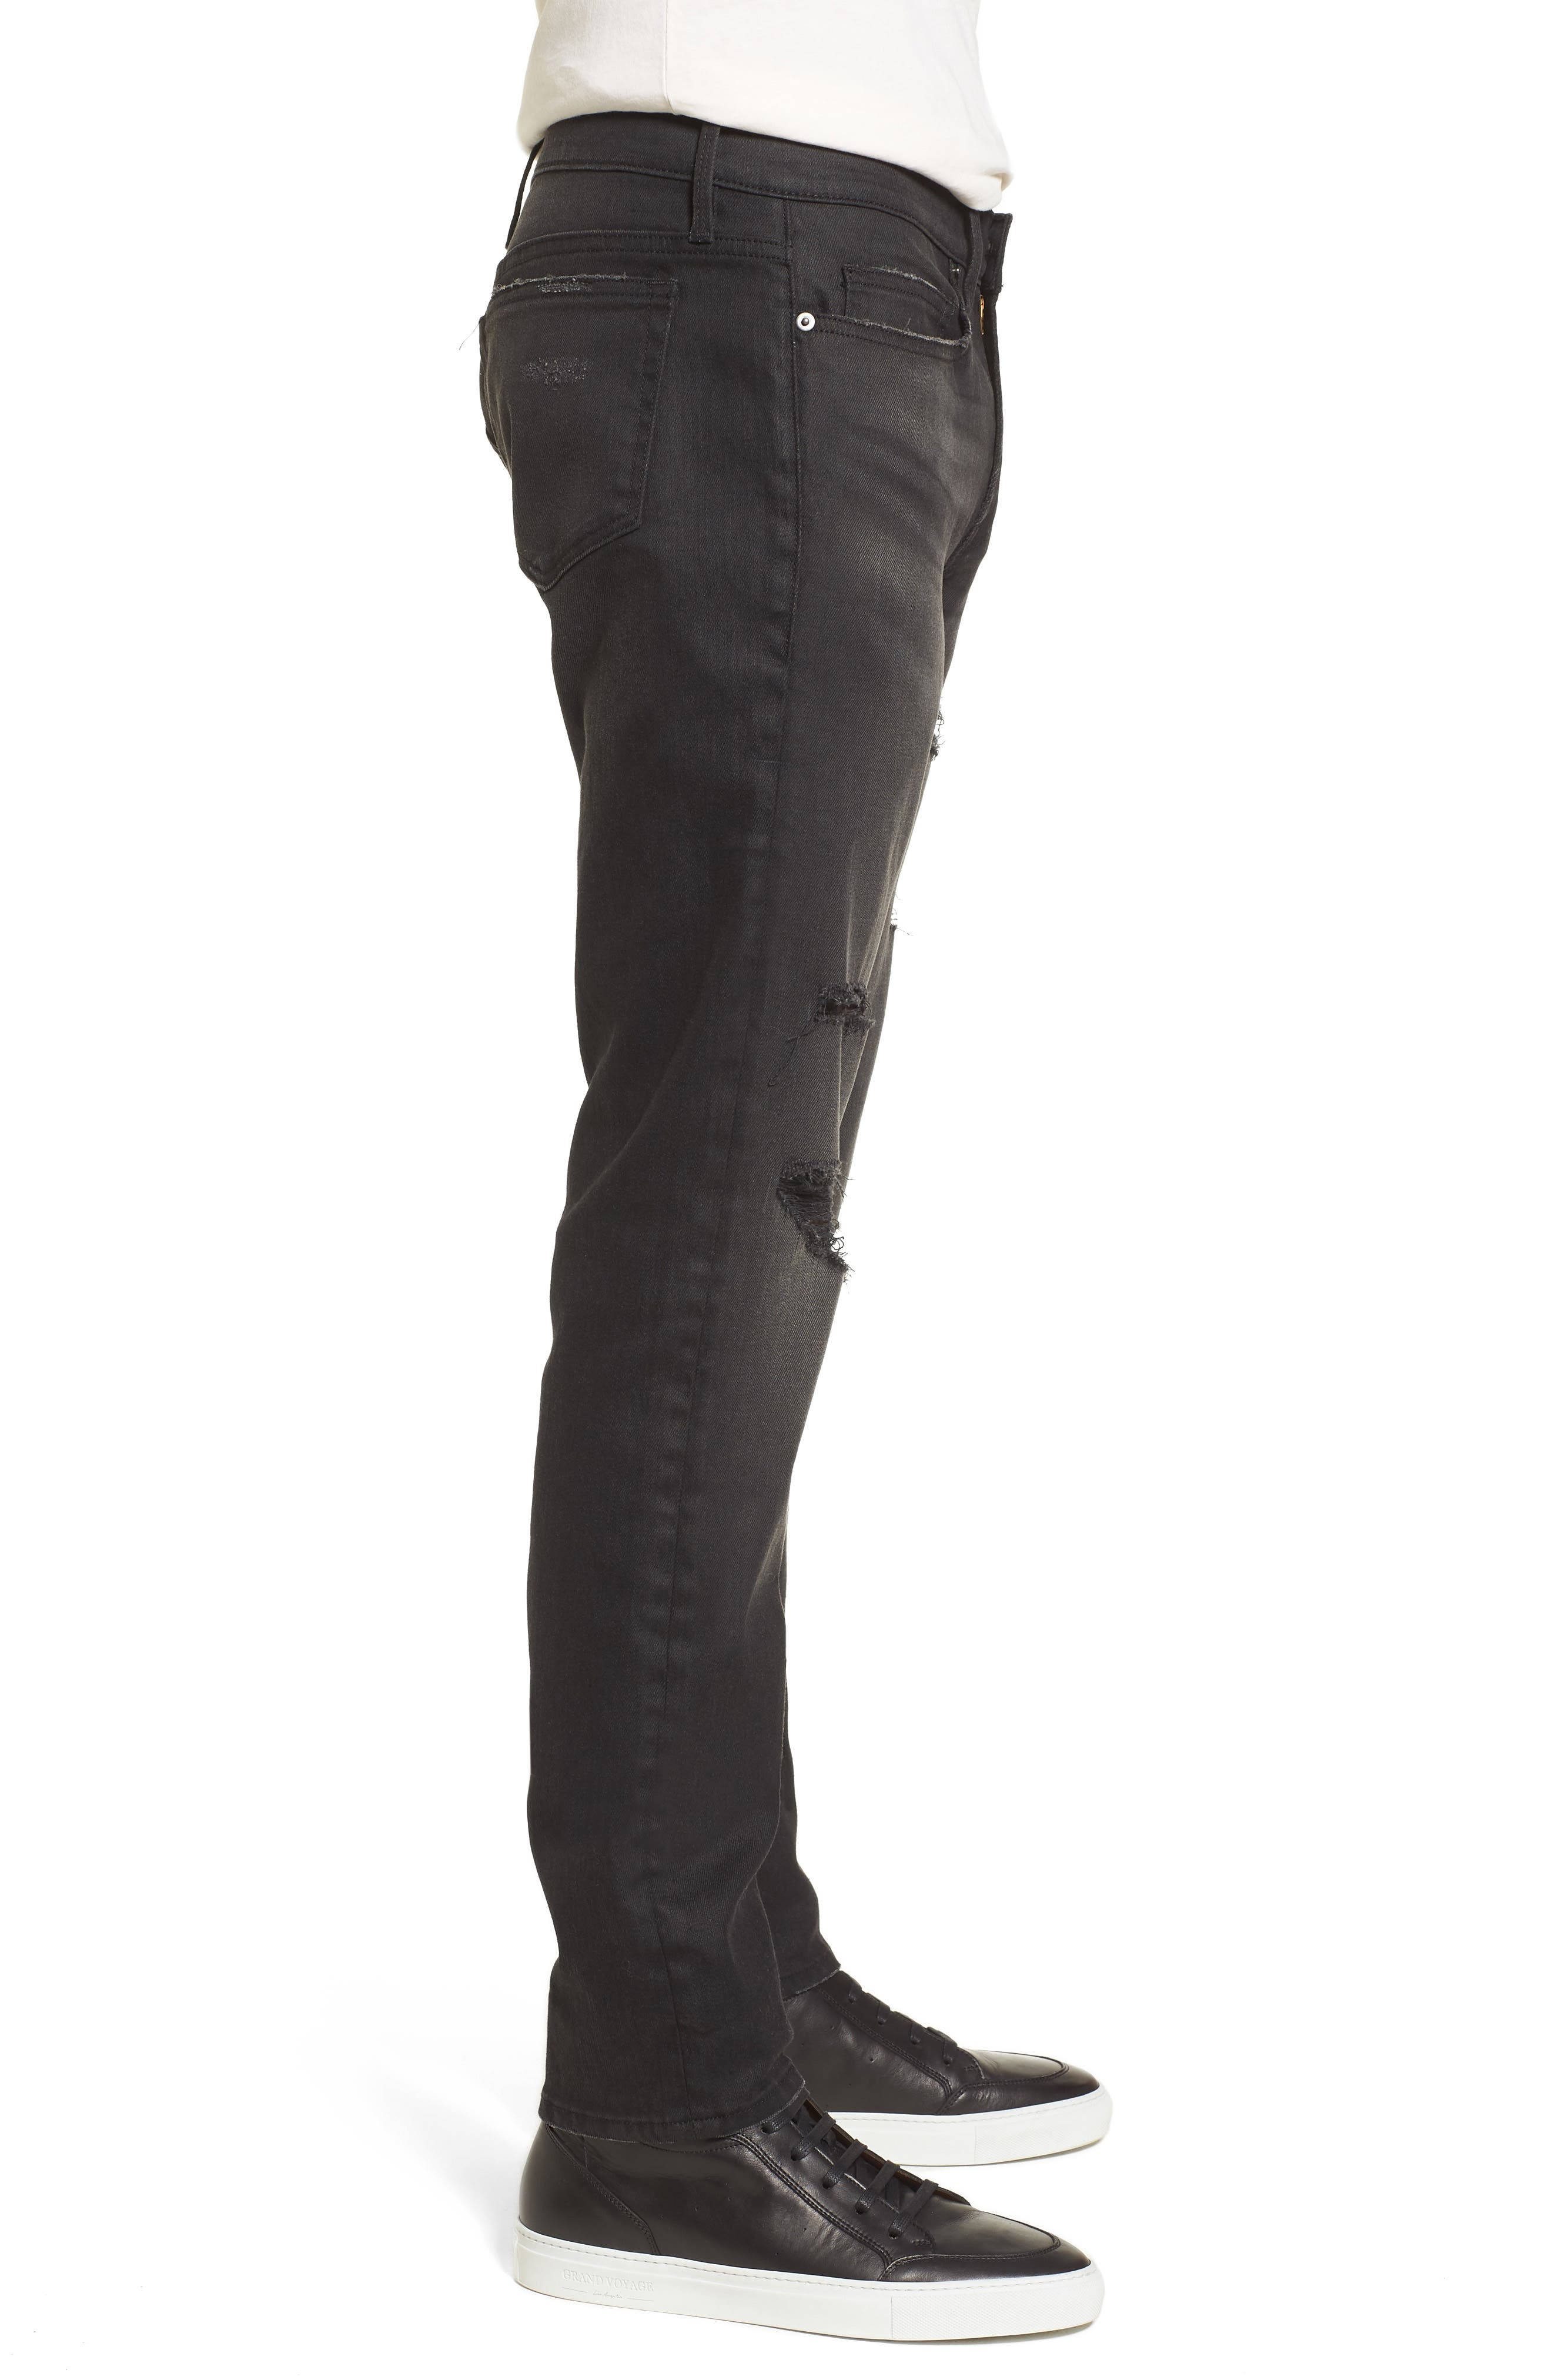 L'Homme Slim Fit Jeans,                             Alternate thumbnail 3, color,                             Flintwood